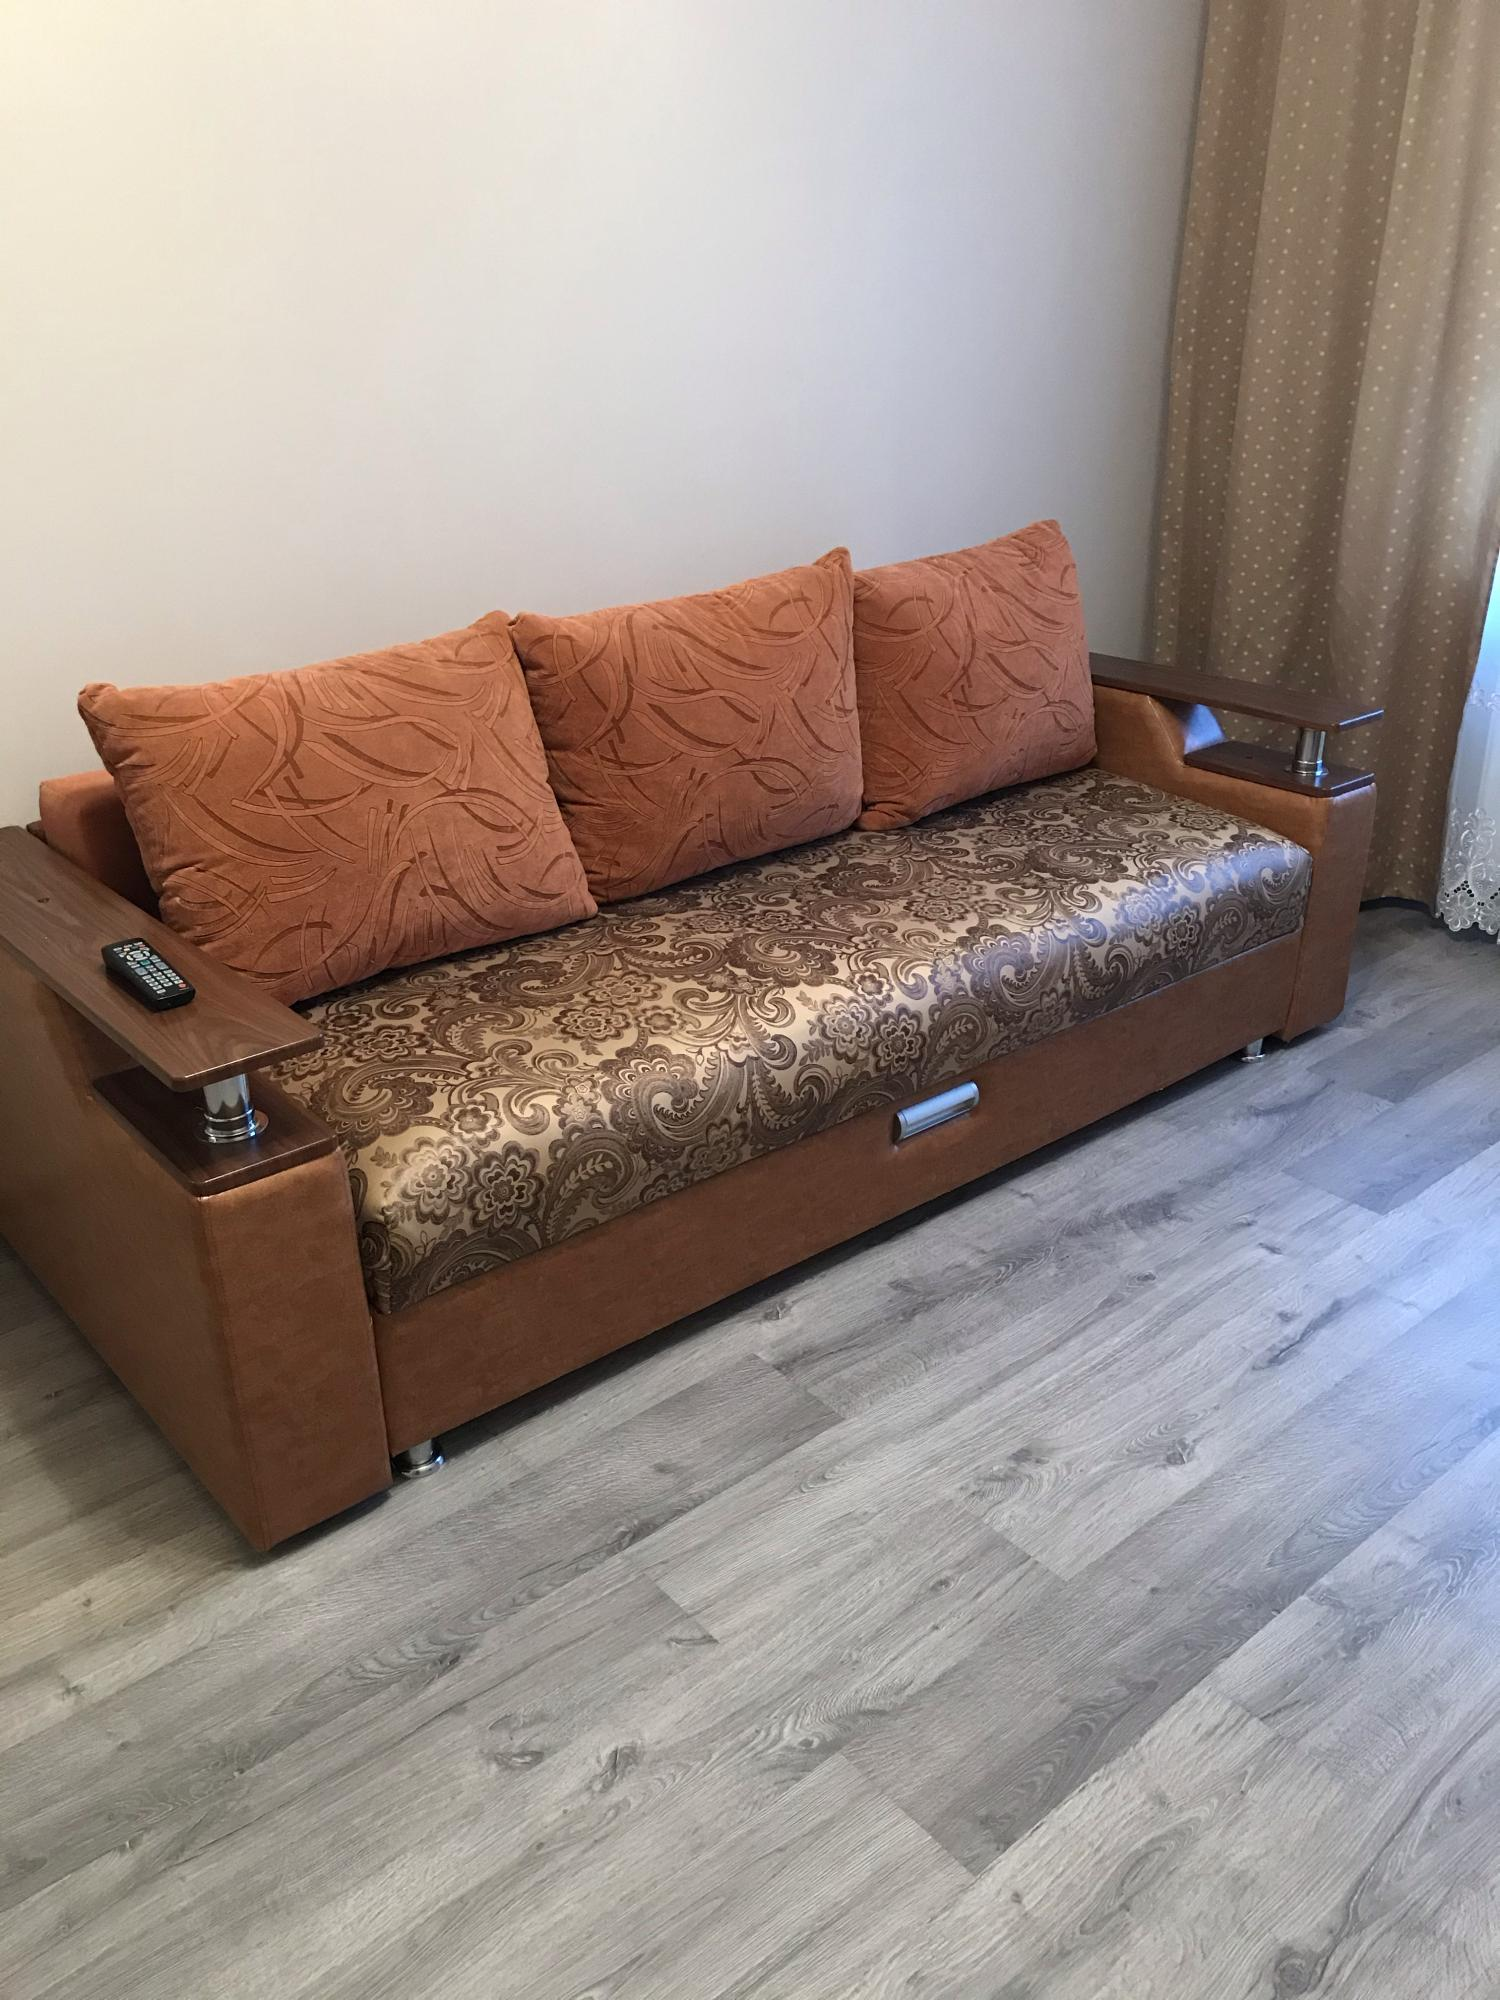 Квартира, 1 комната, 35 м² 89258601492 купить 1